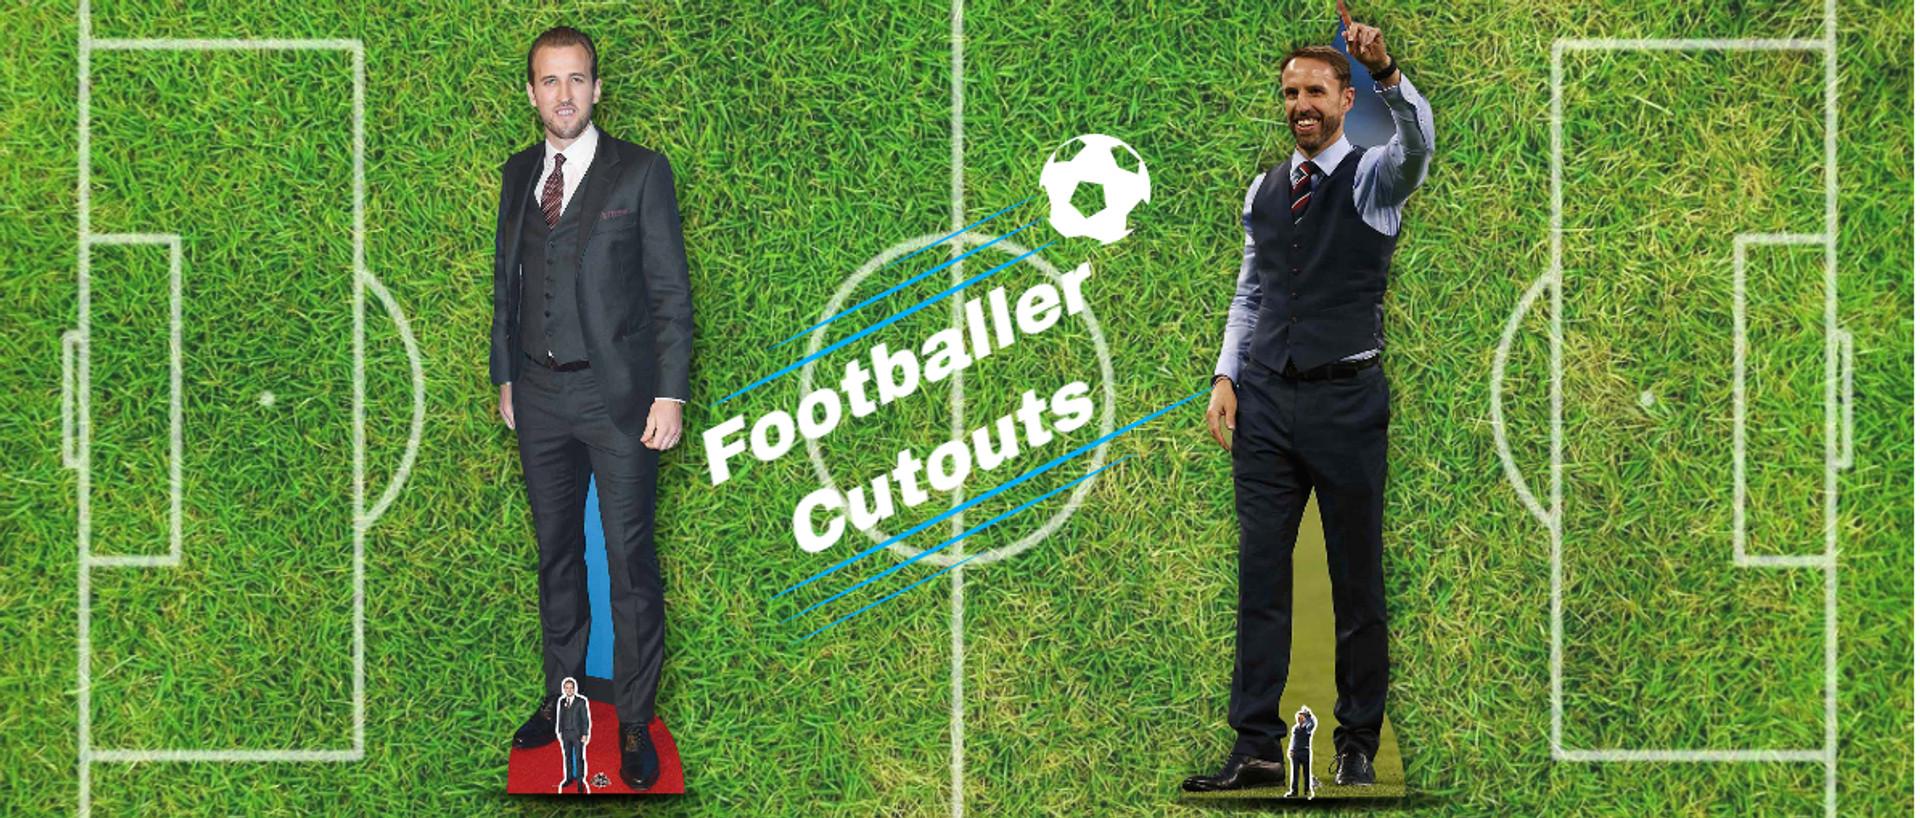 Euro 2020 Football themed cardboard cutouts